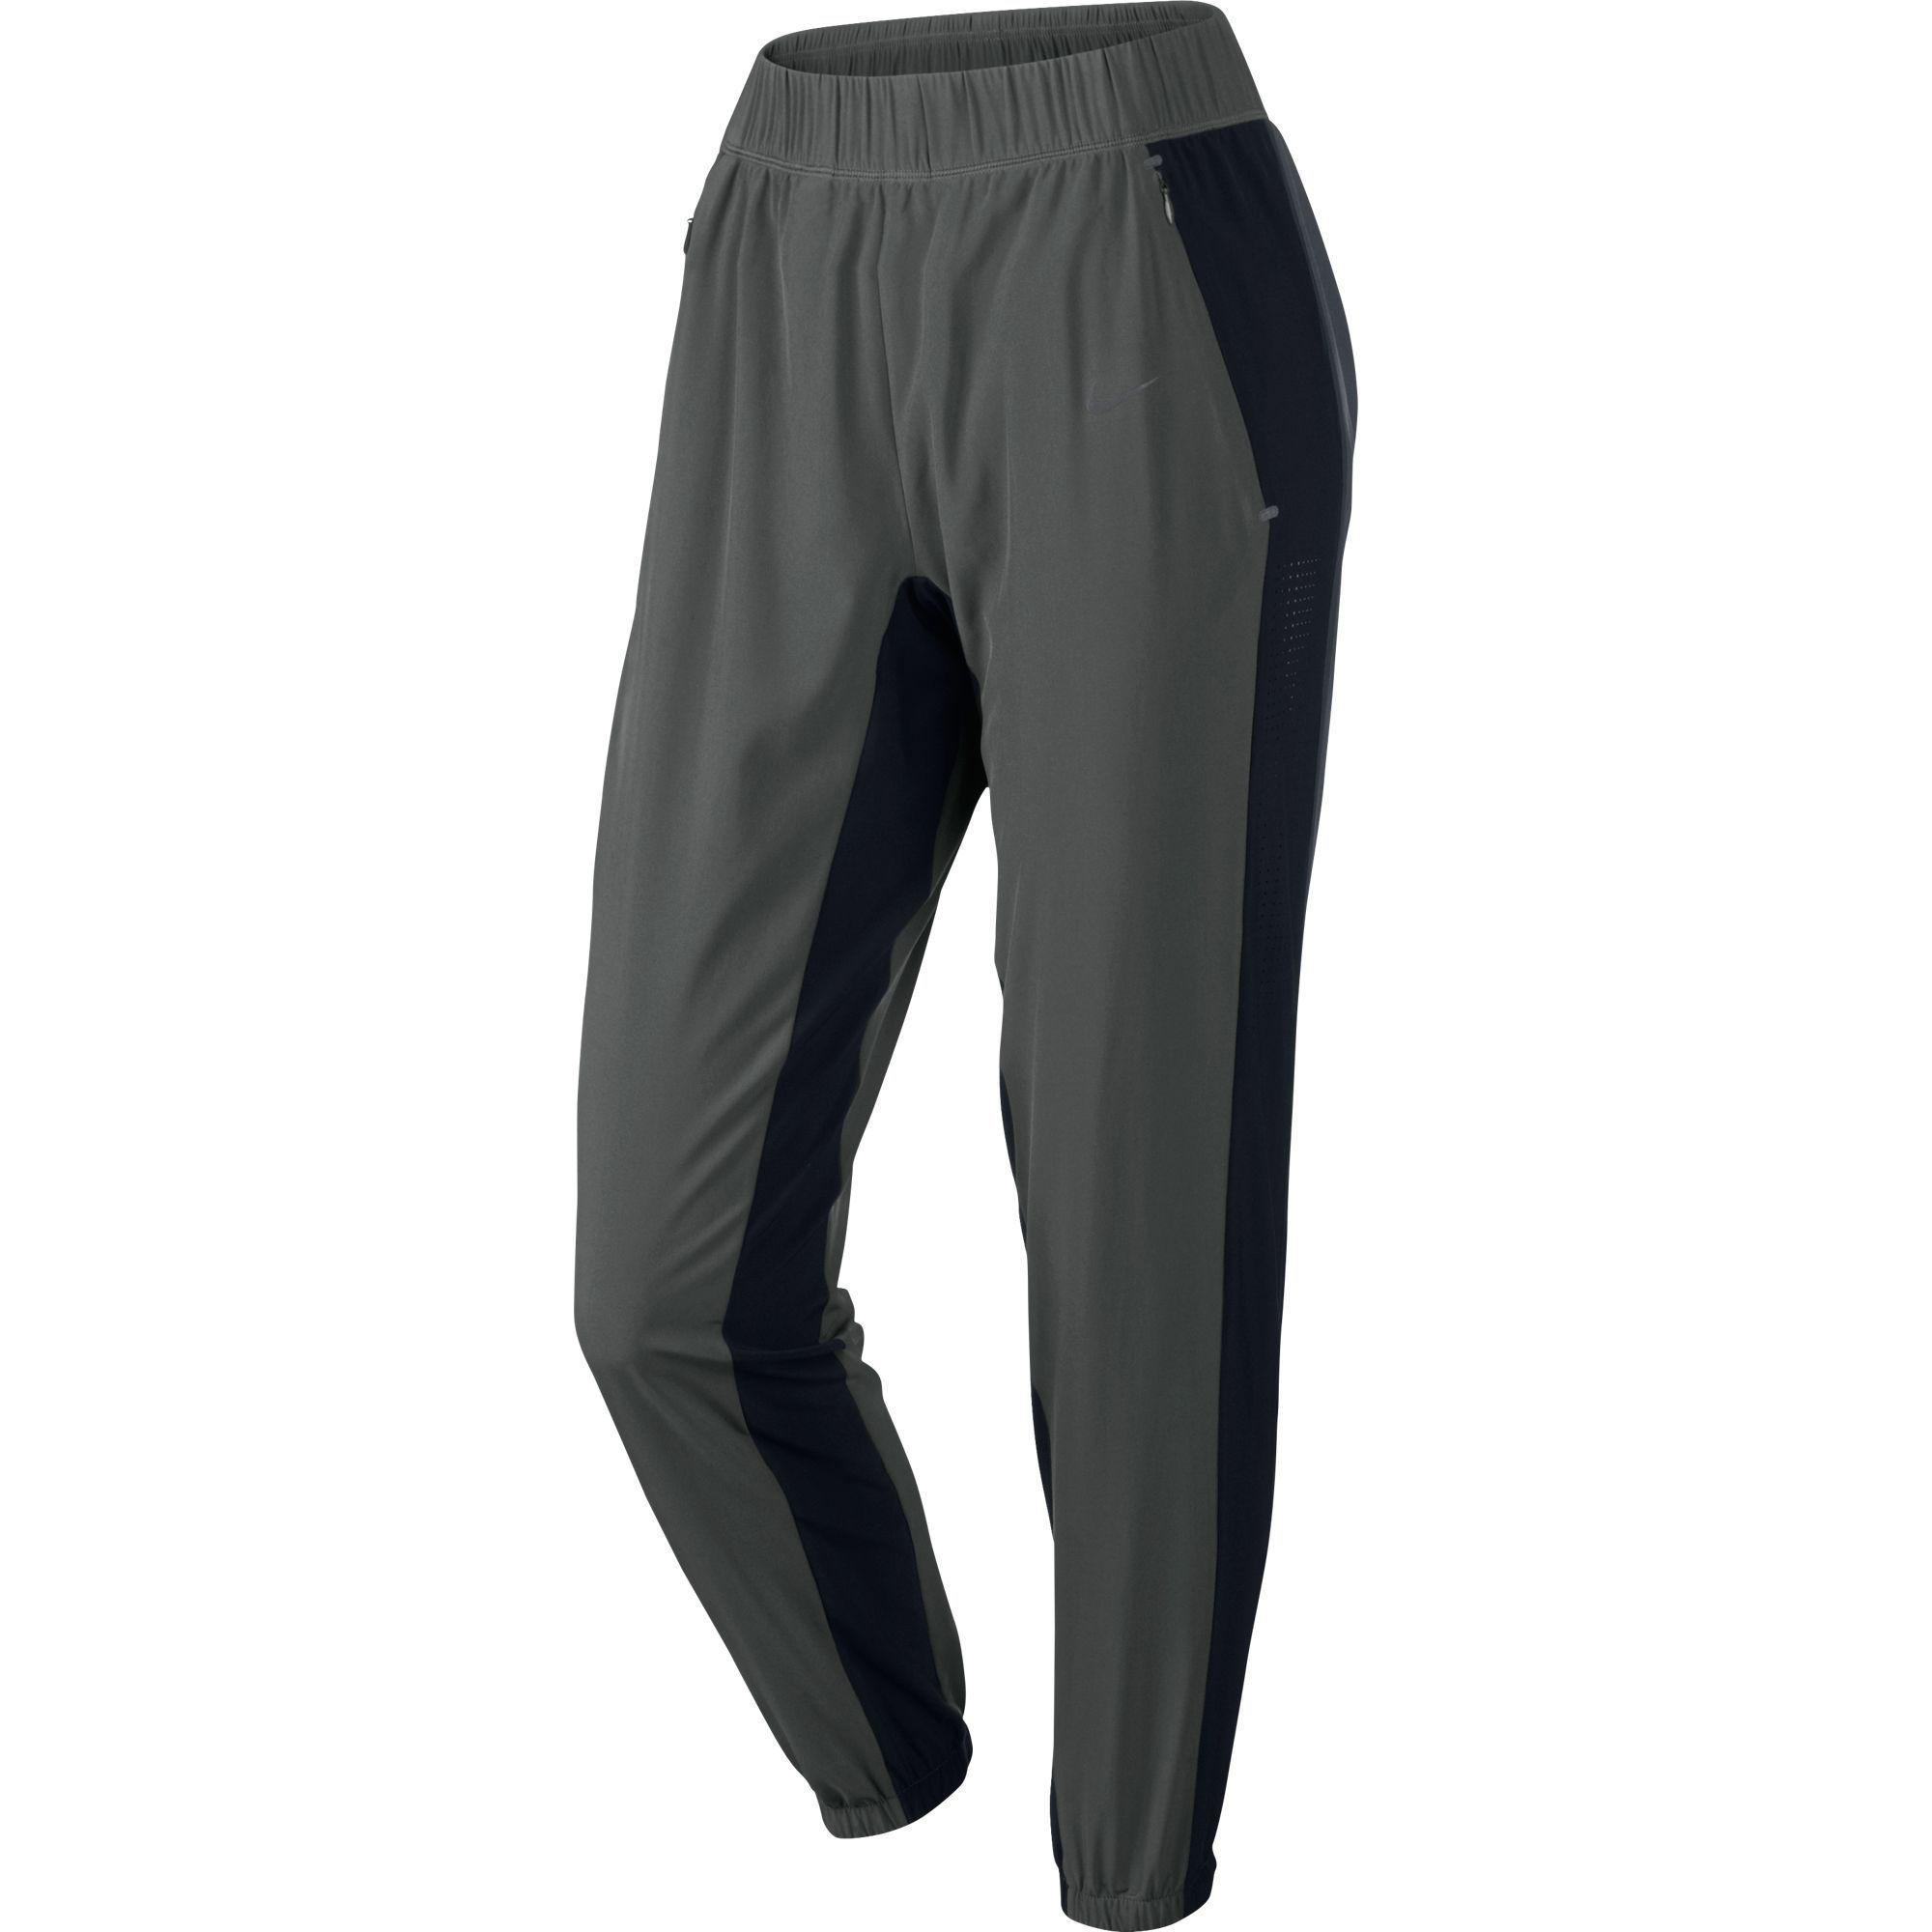 Grey and Black Baseball Uniforms, Pants